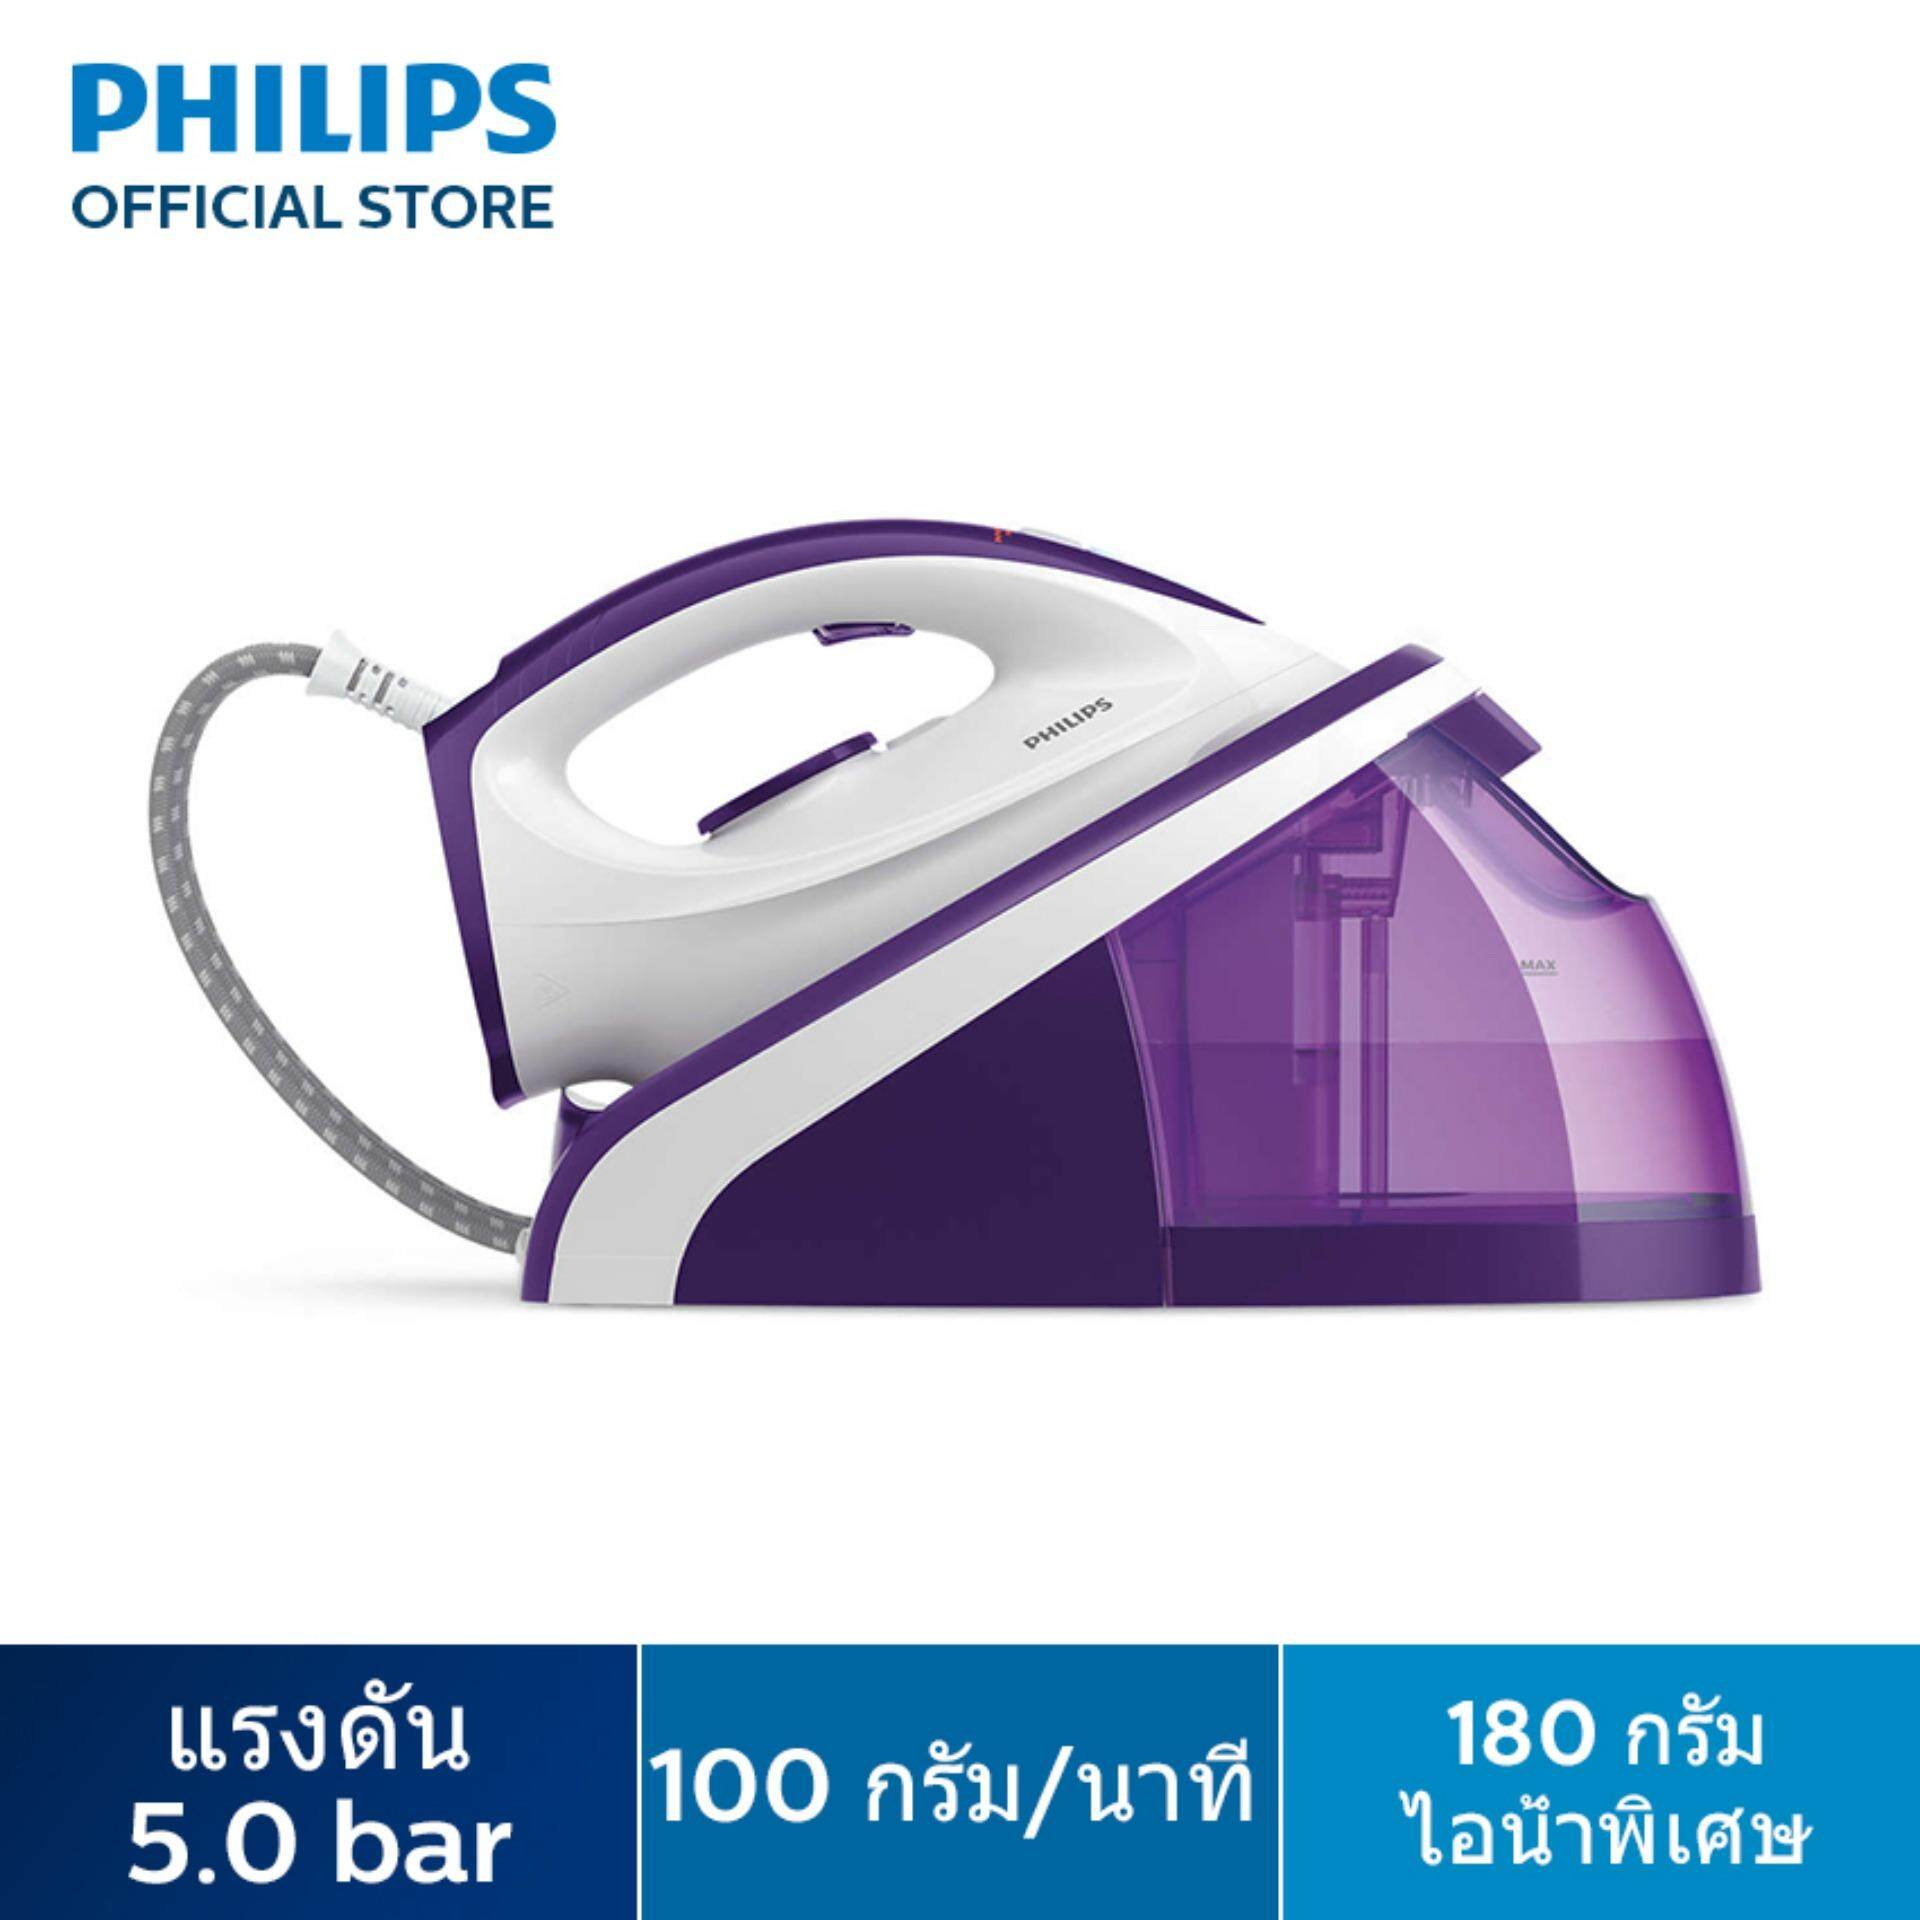 Philips SpeedCare HI5914/30 เตารีดแรงดันไอน้ำ